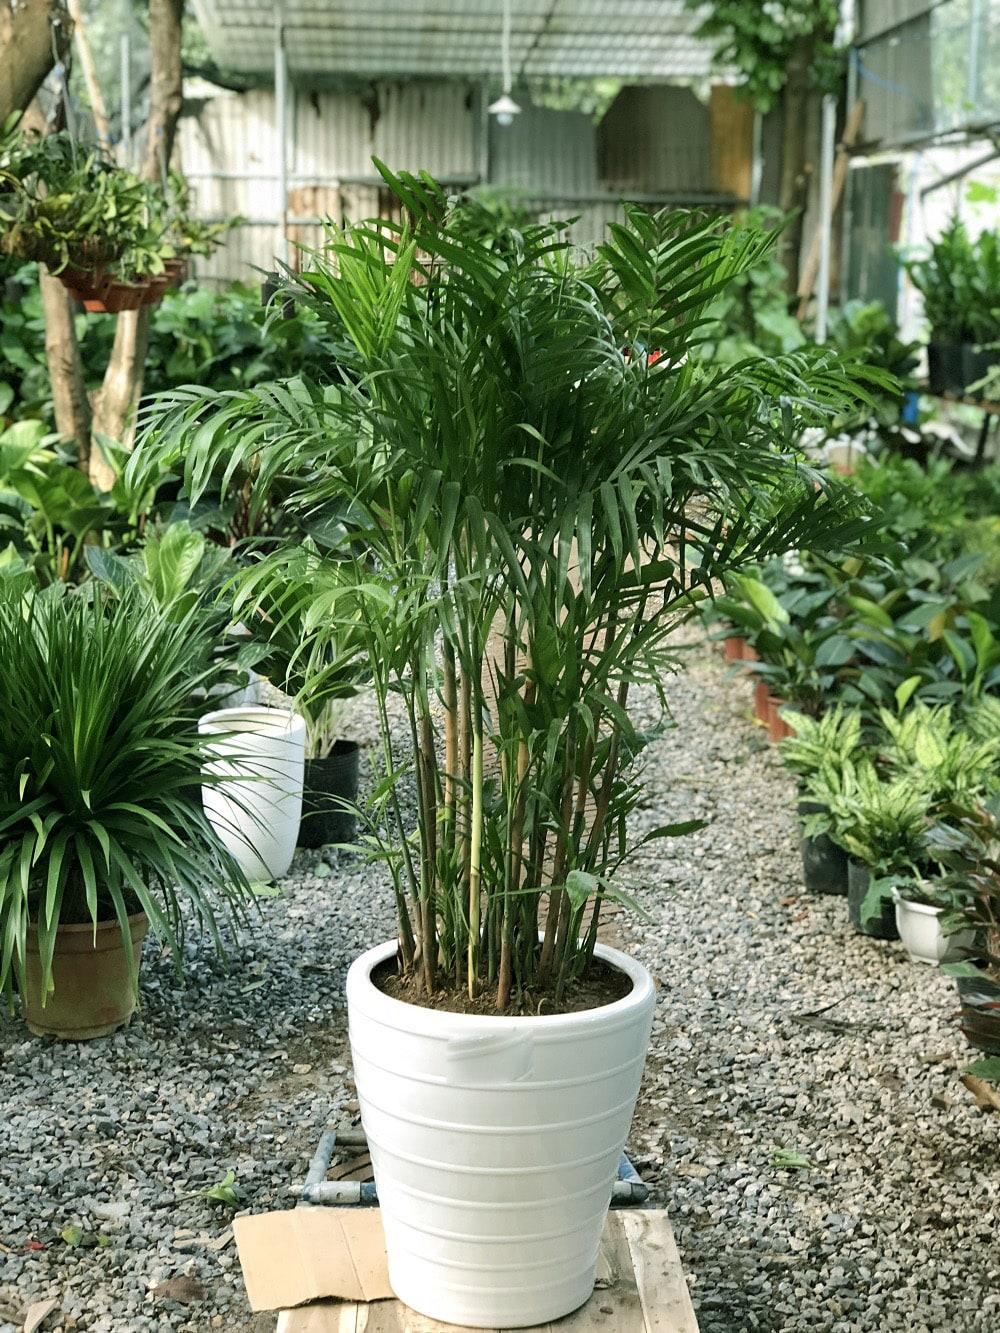 chậu cây hawai  mới trồng